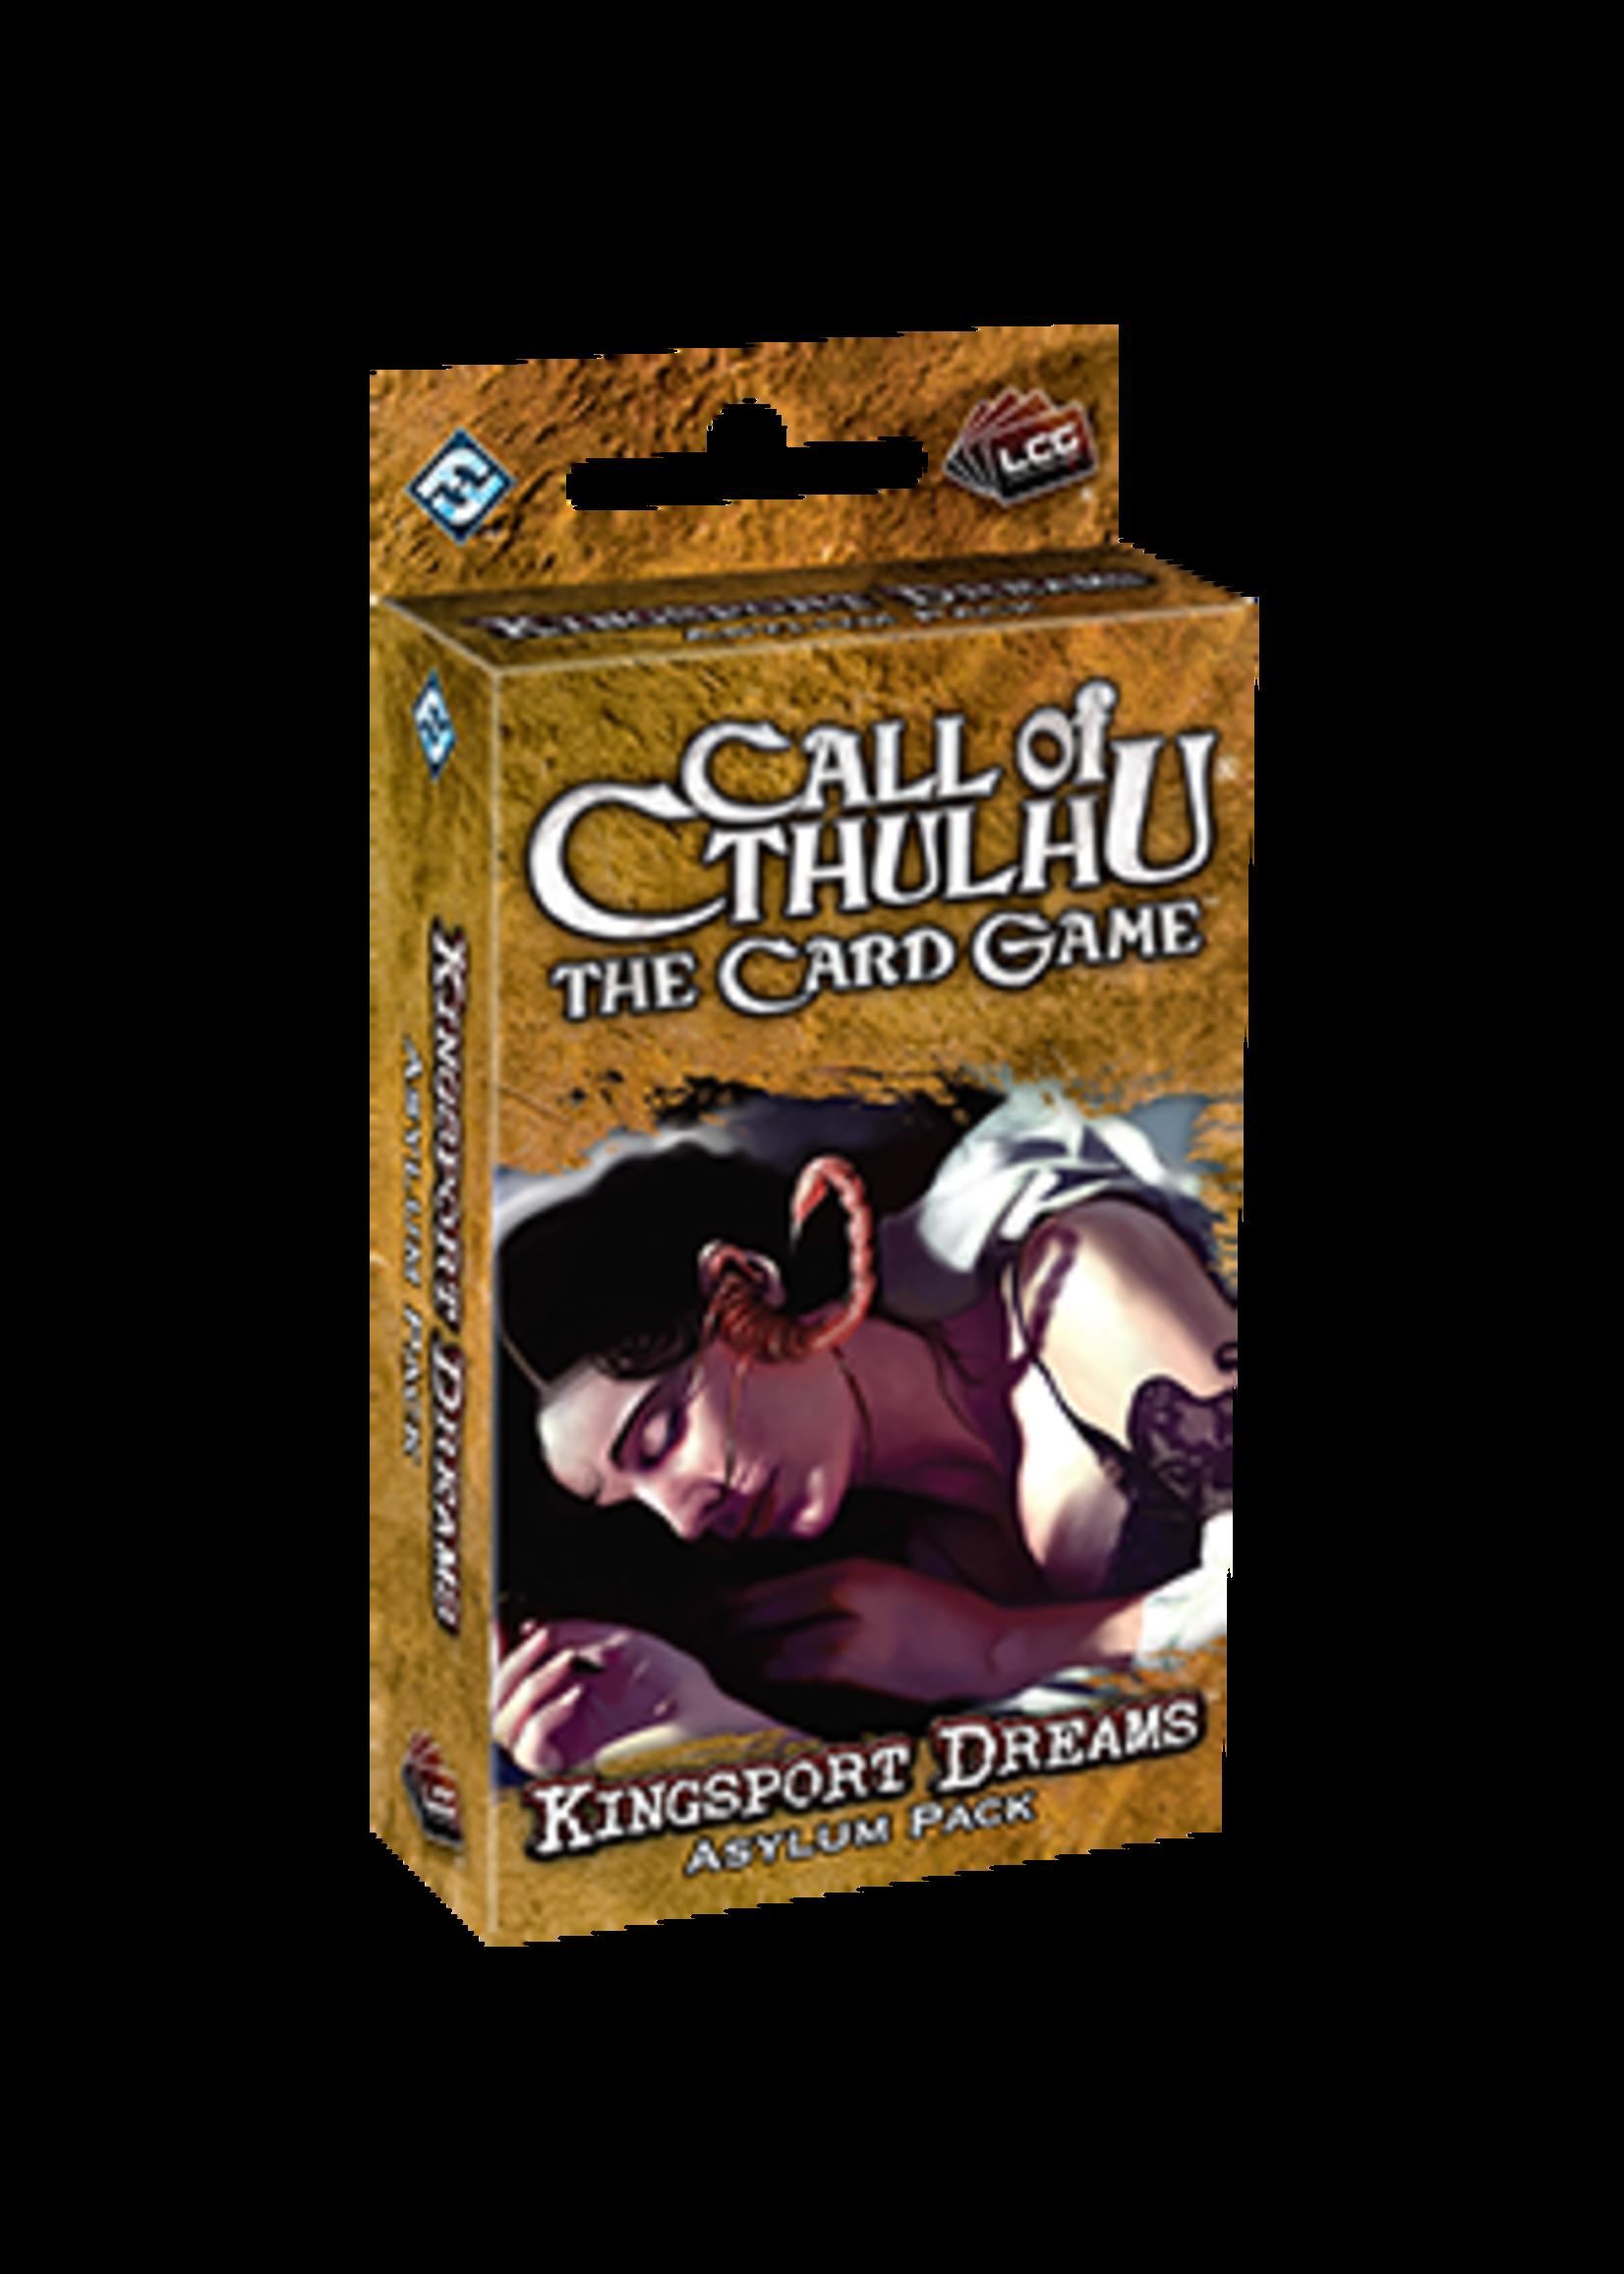 Call of Cthulhu LCG: Kingsport Dreams Asylum Pack